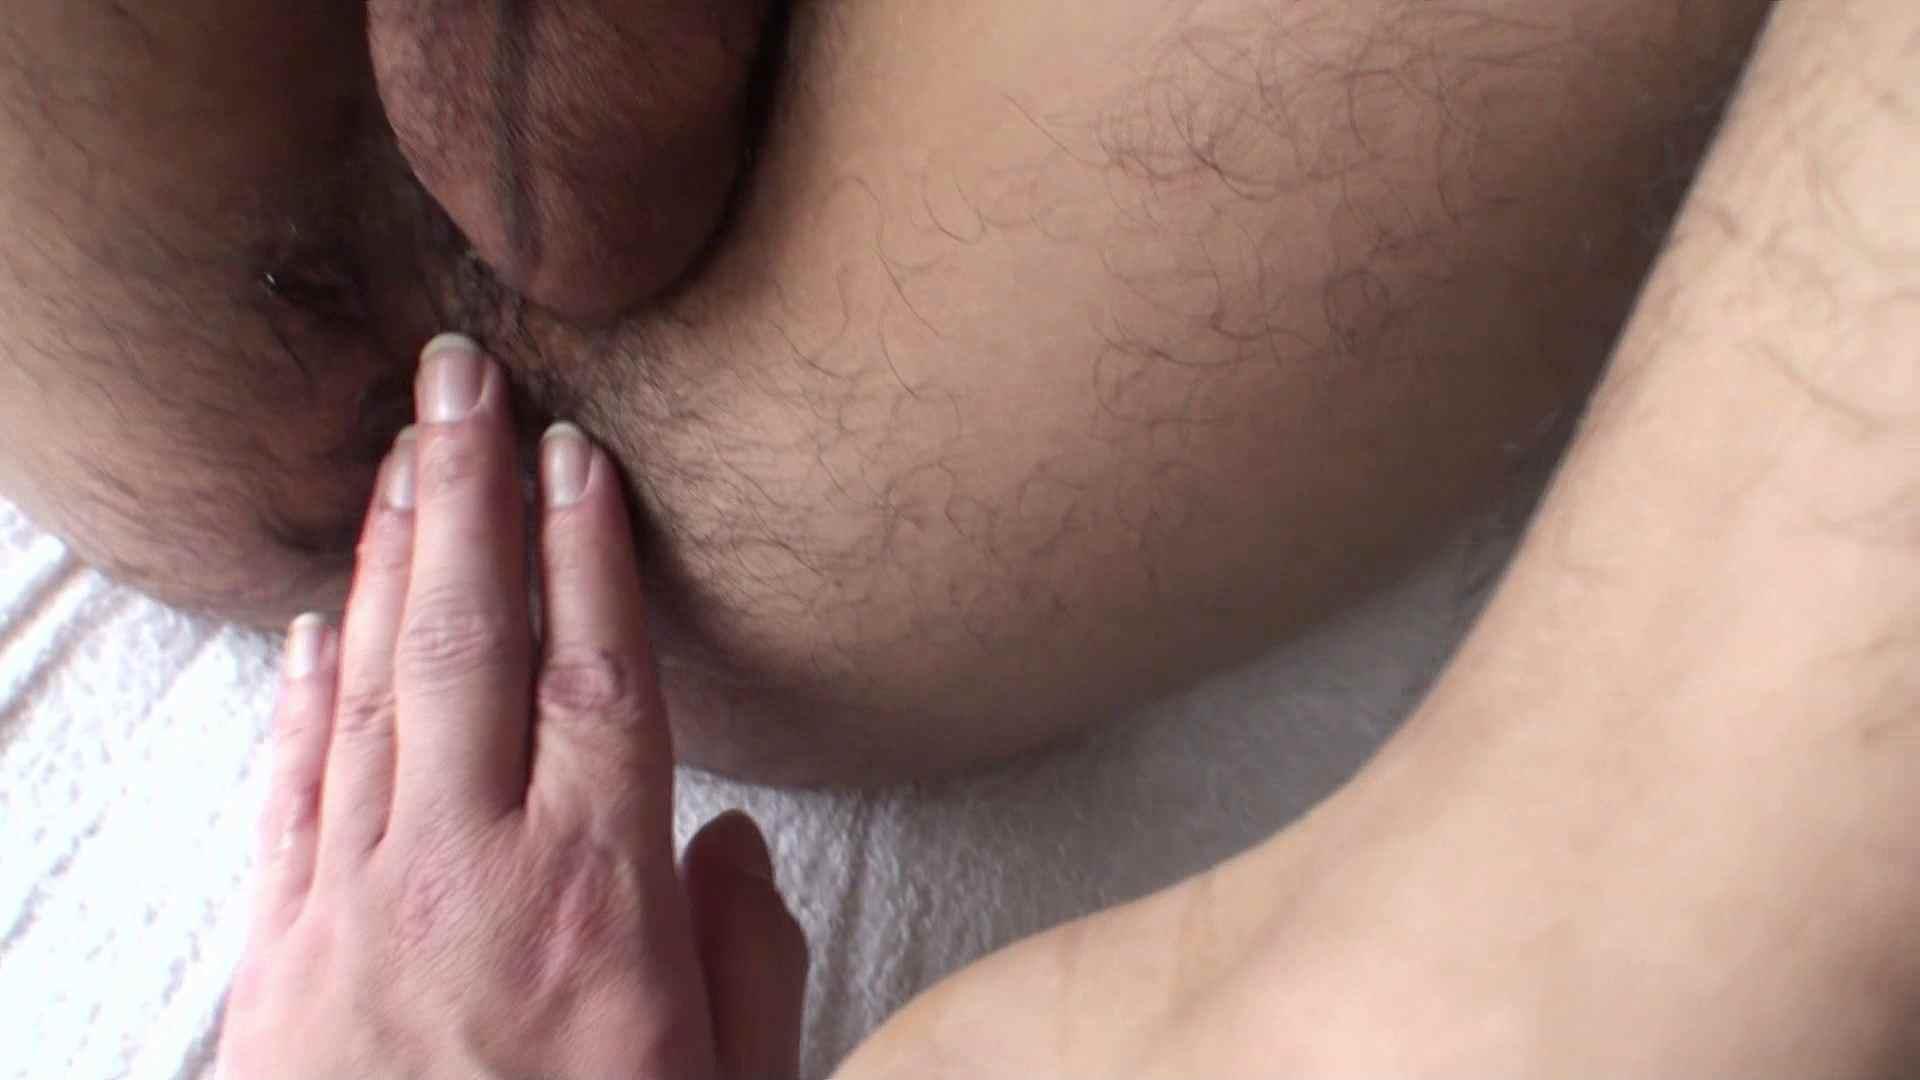 HD 良太と健二当たり前の日常 セックス編 男天国 | サル系ボーイズ  50pic 18